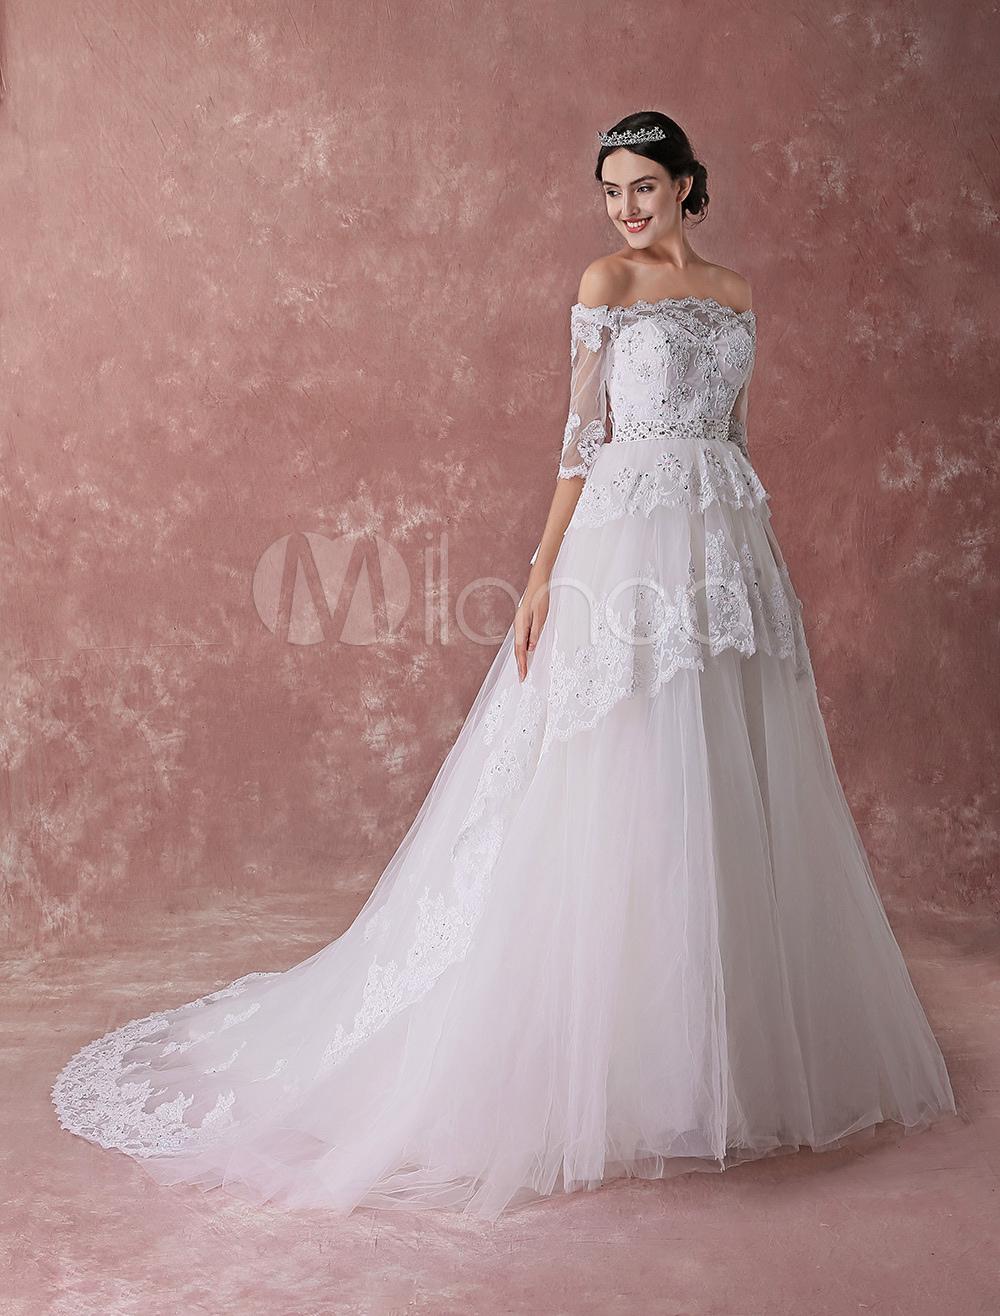 86643f77e444 Bridal Dresses In White Color - raveitsafe